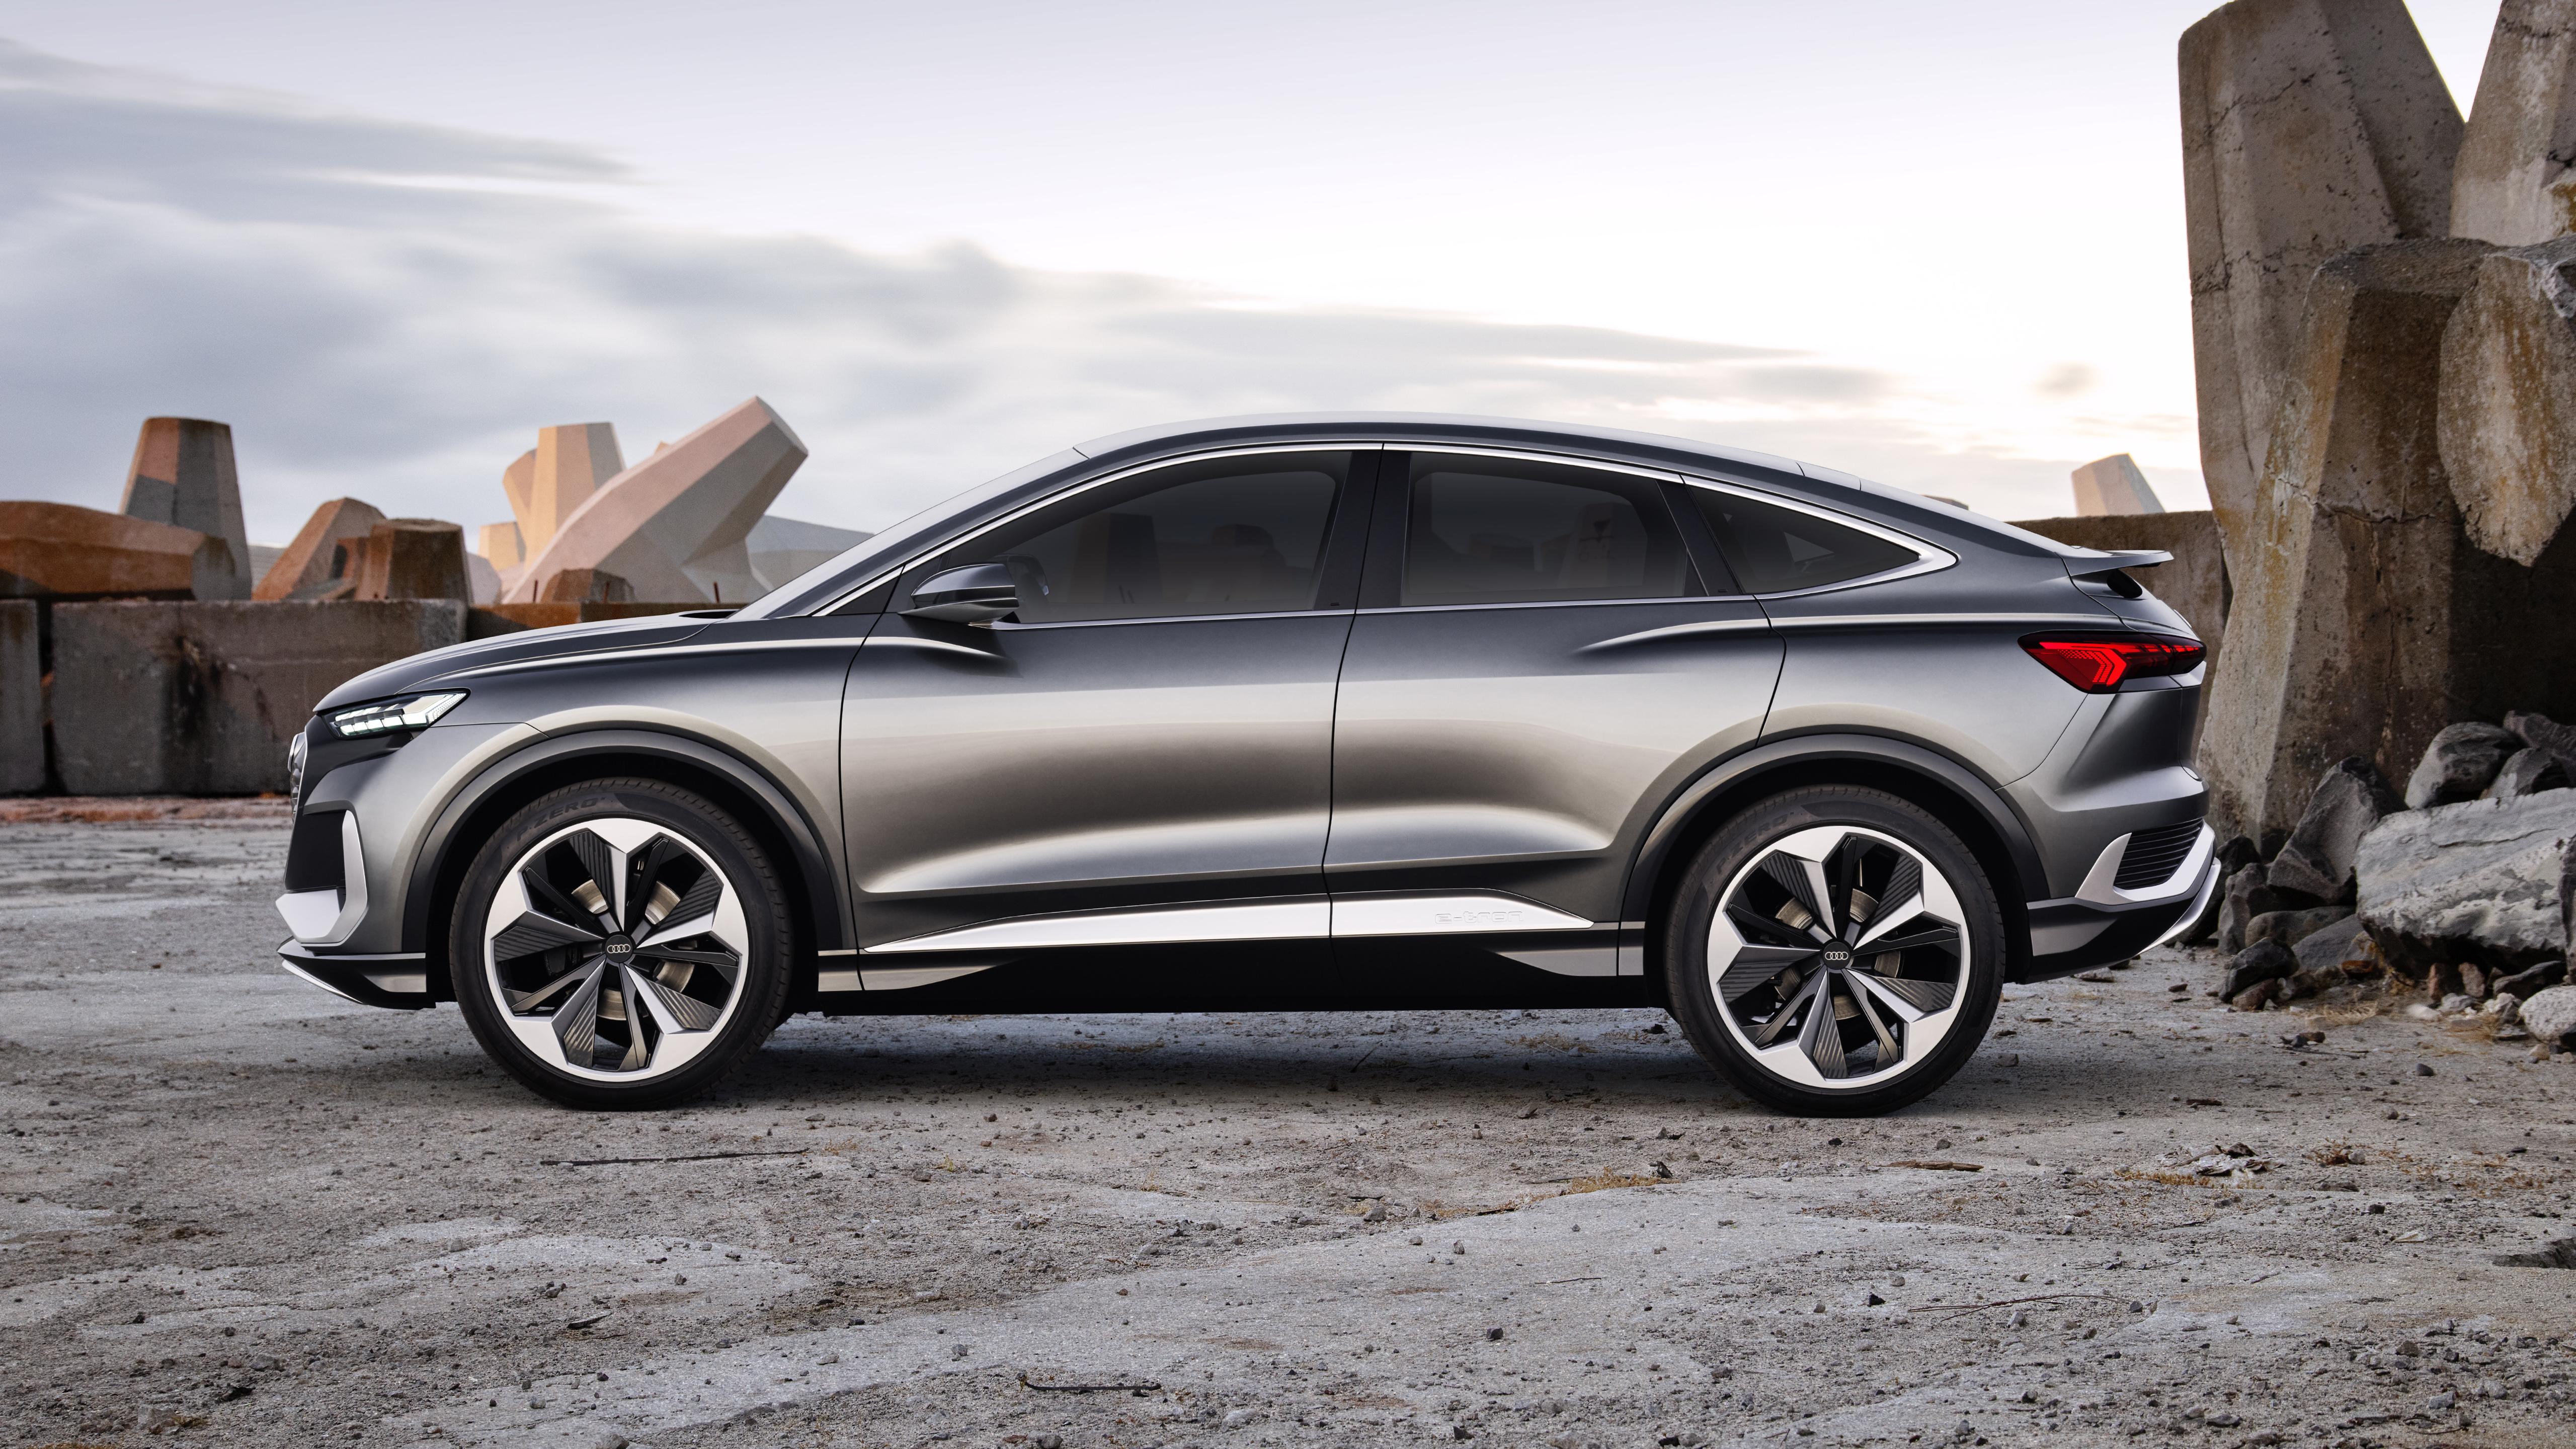 audi q4 sportback e-tron concept 2020 5k wallpaper | hd